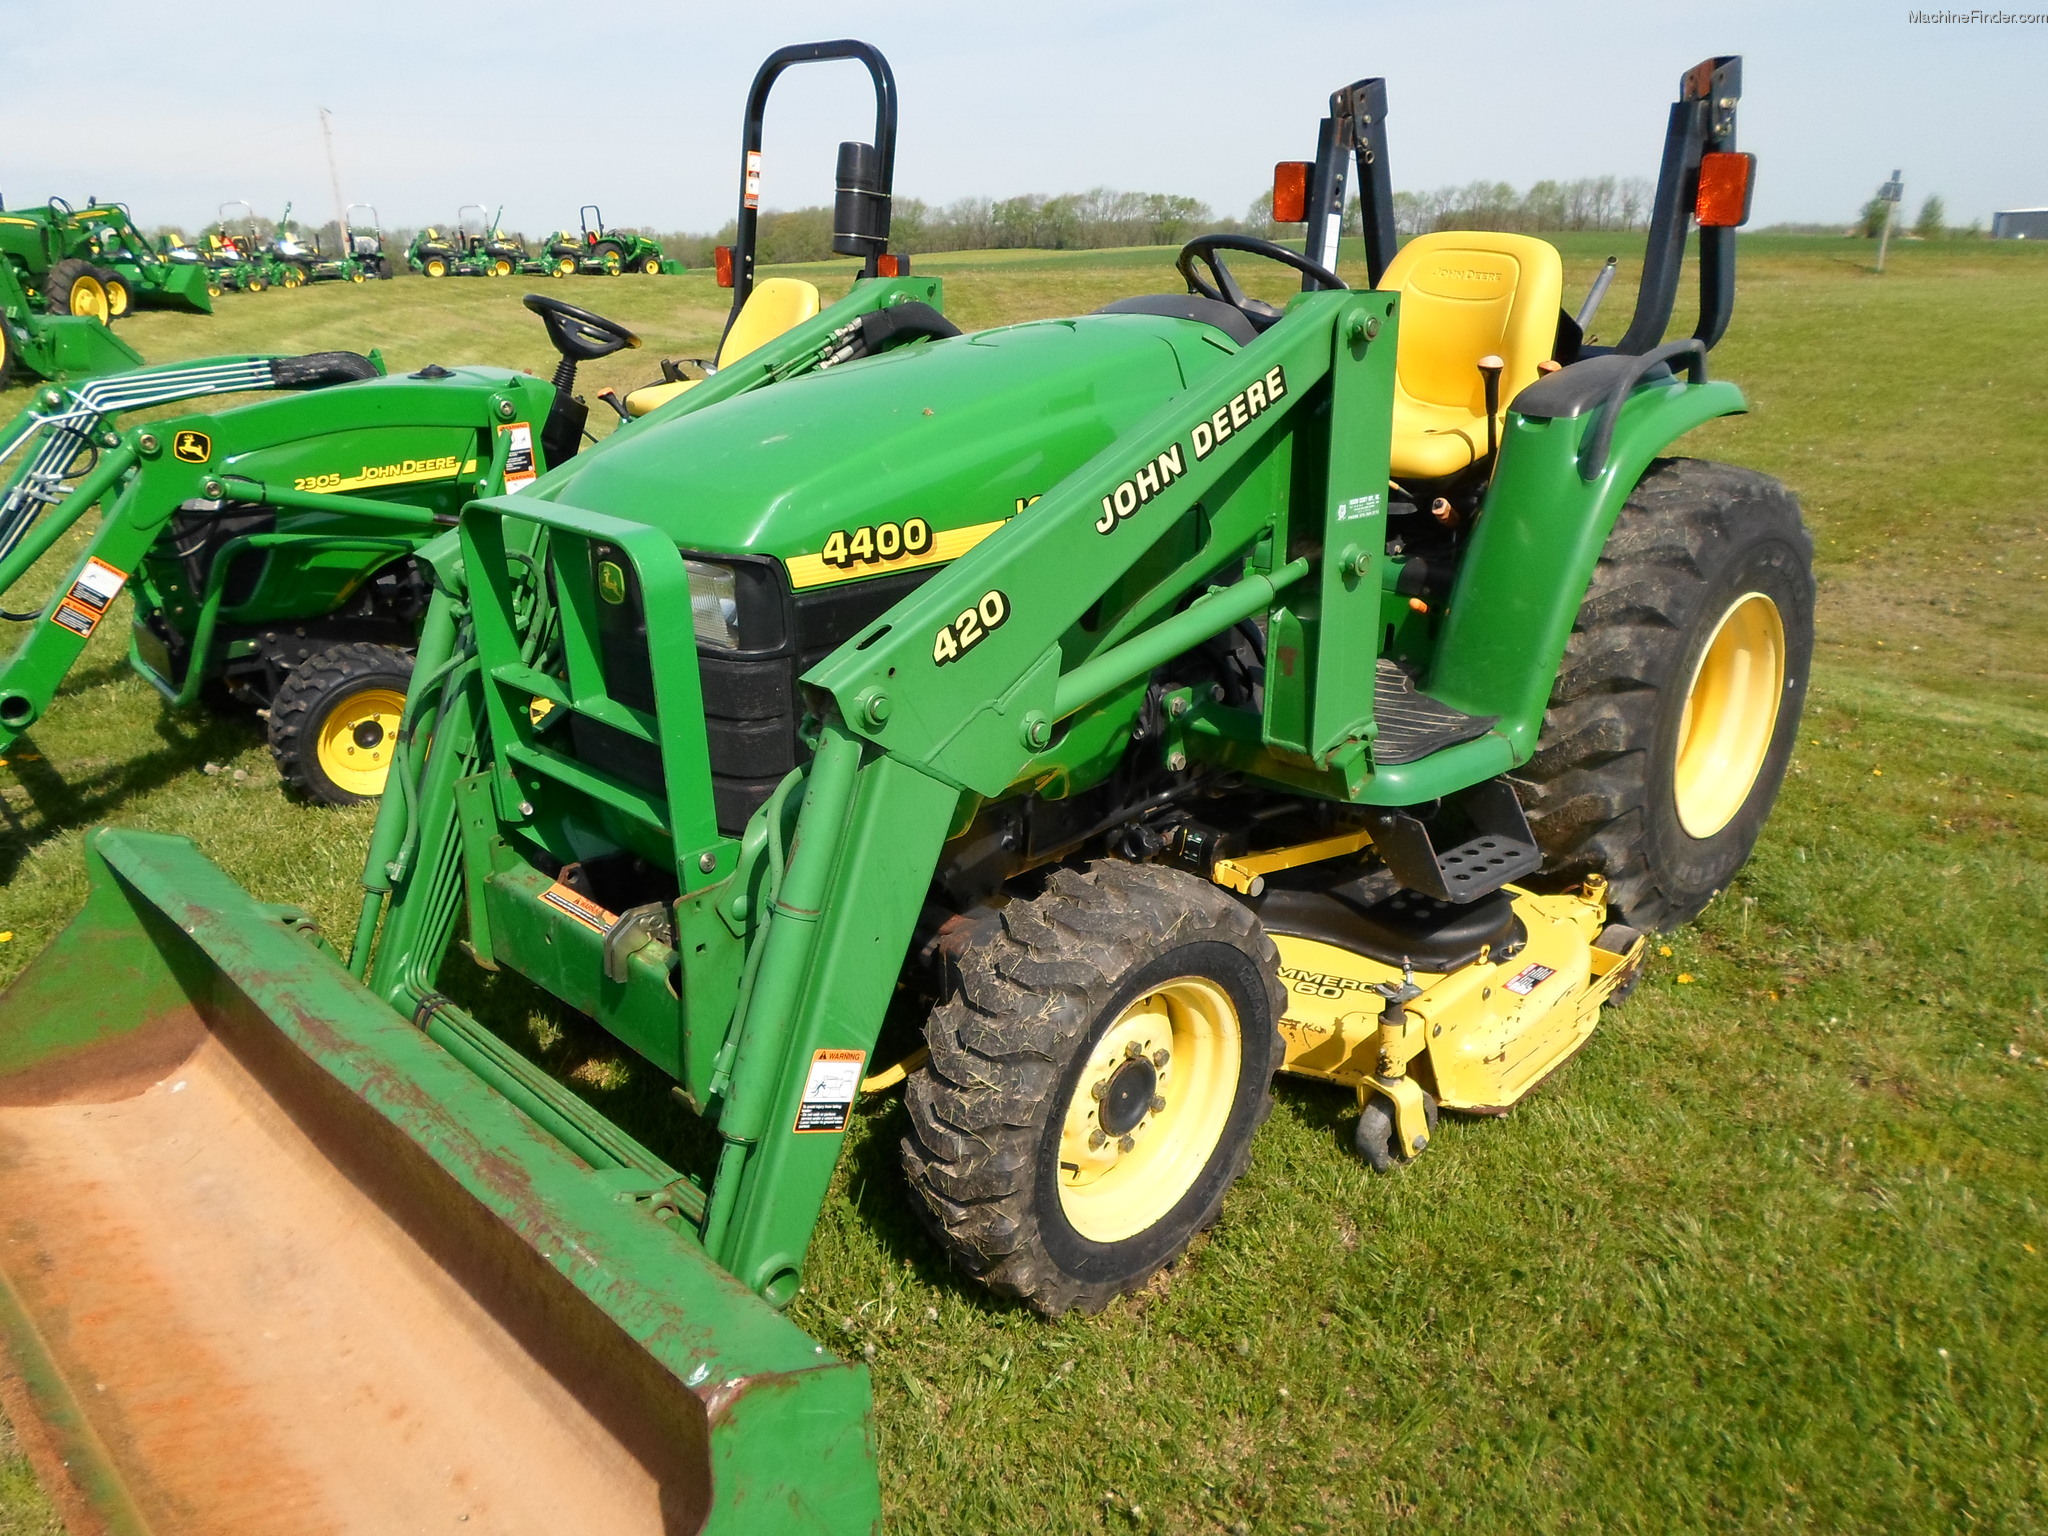 1998 John Deere 4400 Tractors - Compact (1-40hp.) - John ...